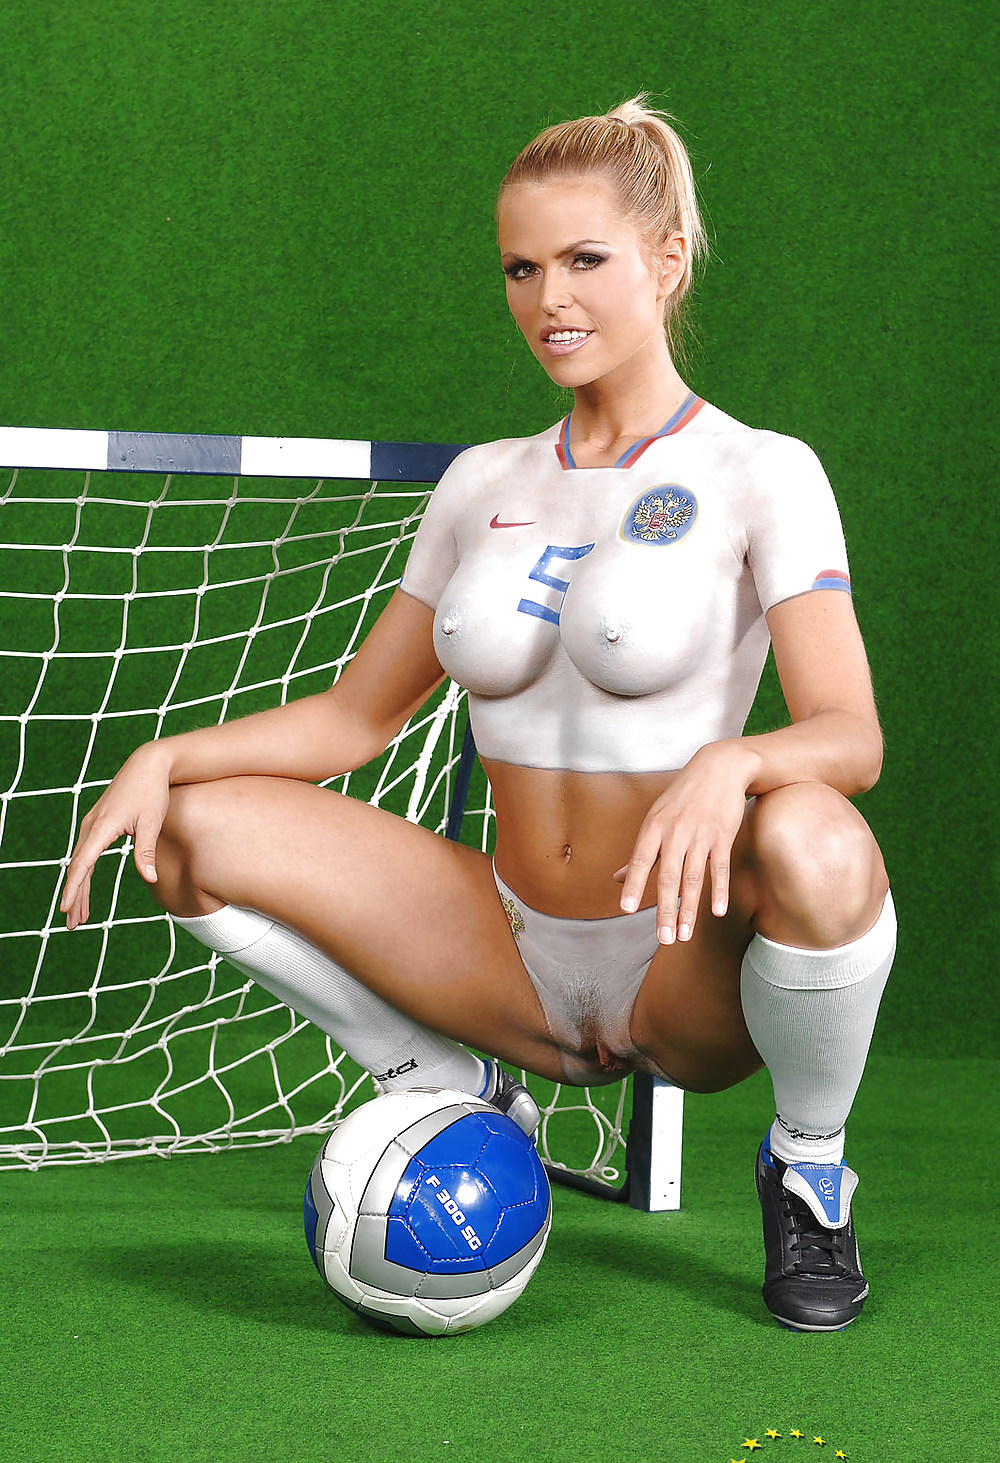 Women fucking football players mature sex